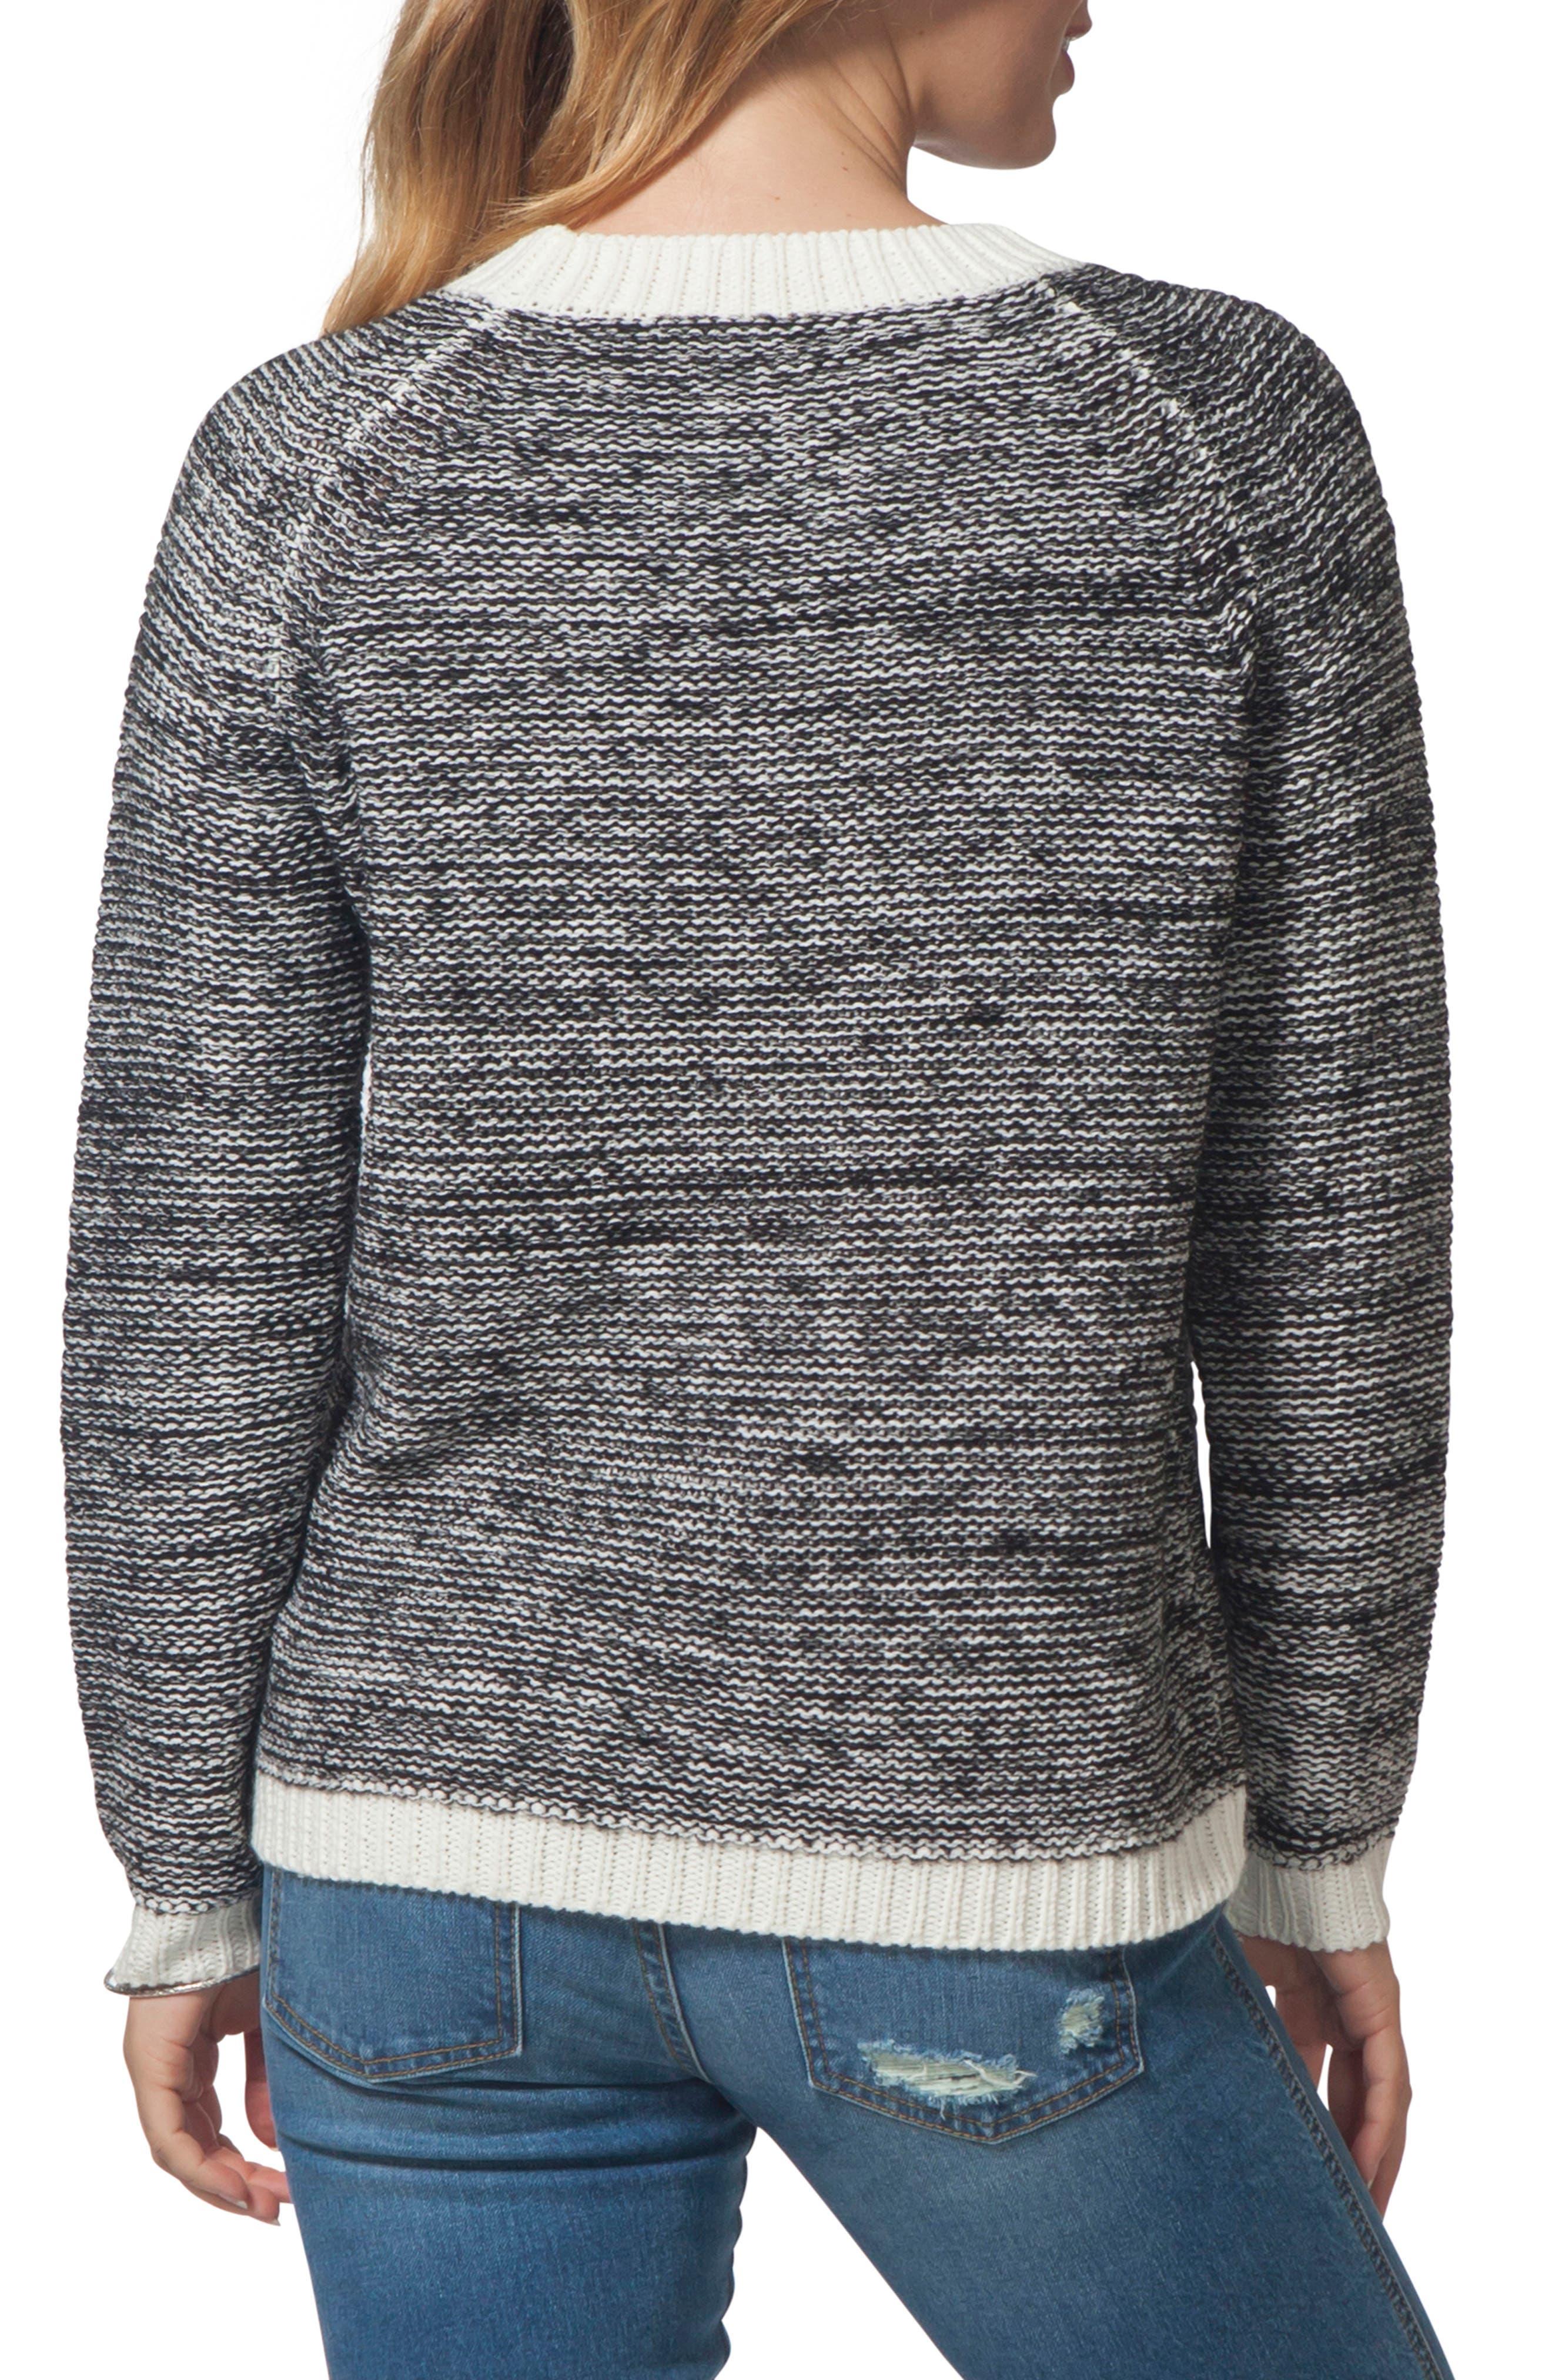 Beachside Crewneck Sweater,                             Alternate thumbnail 2, color,                             CASTOR GRAY